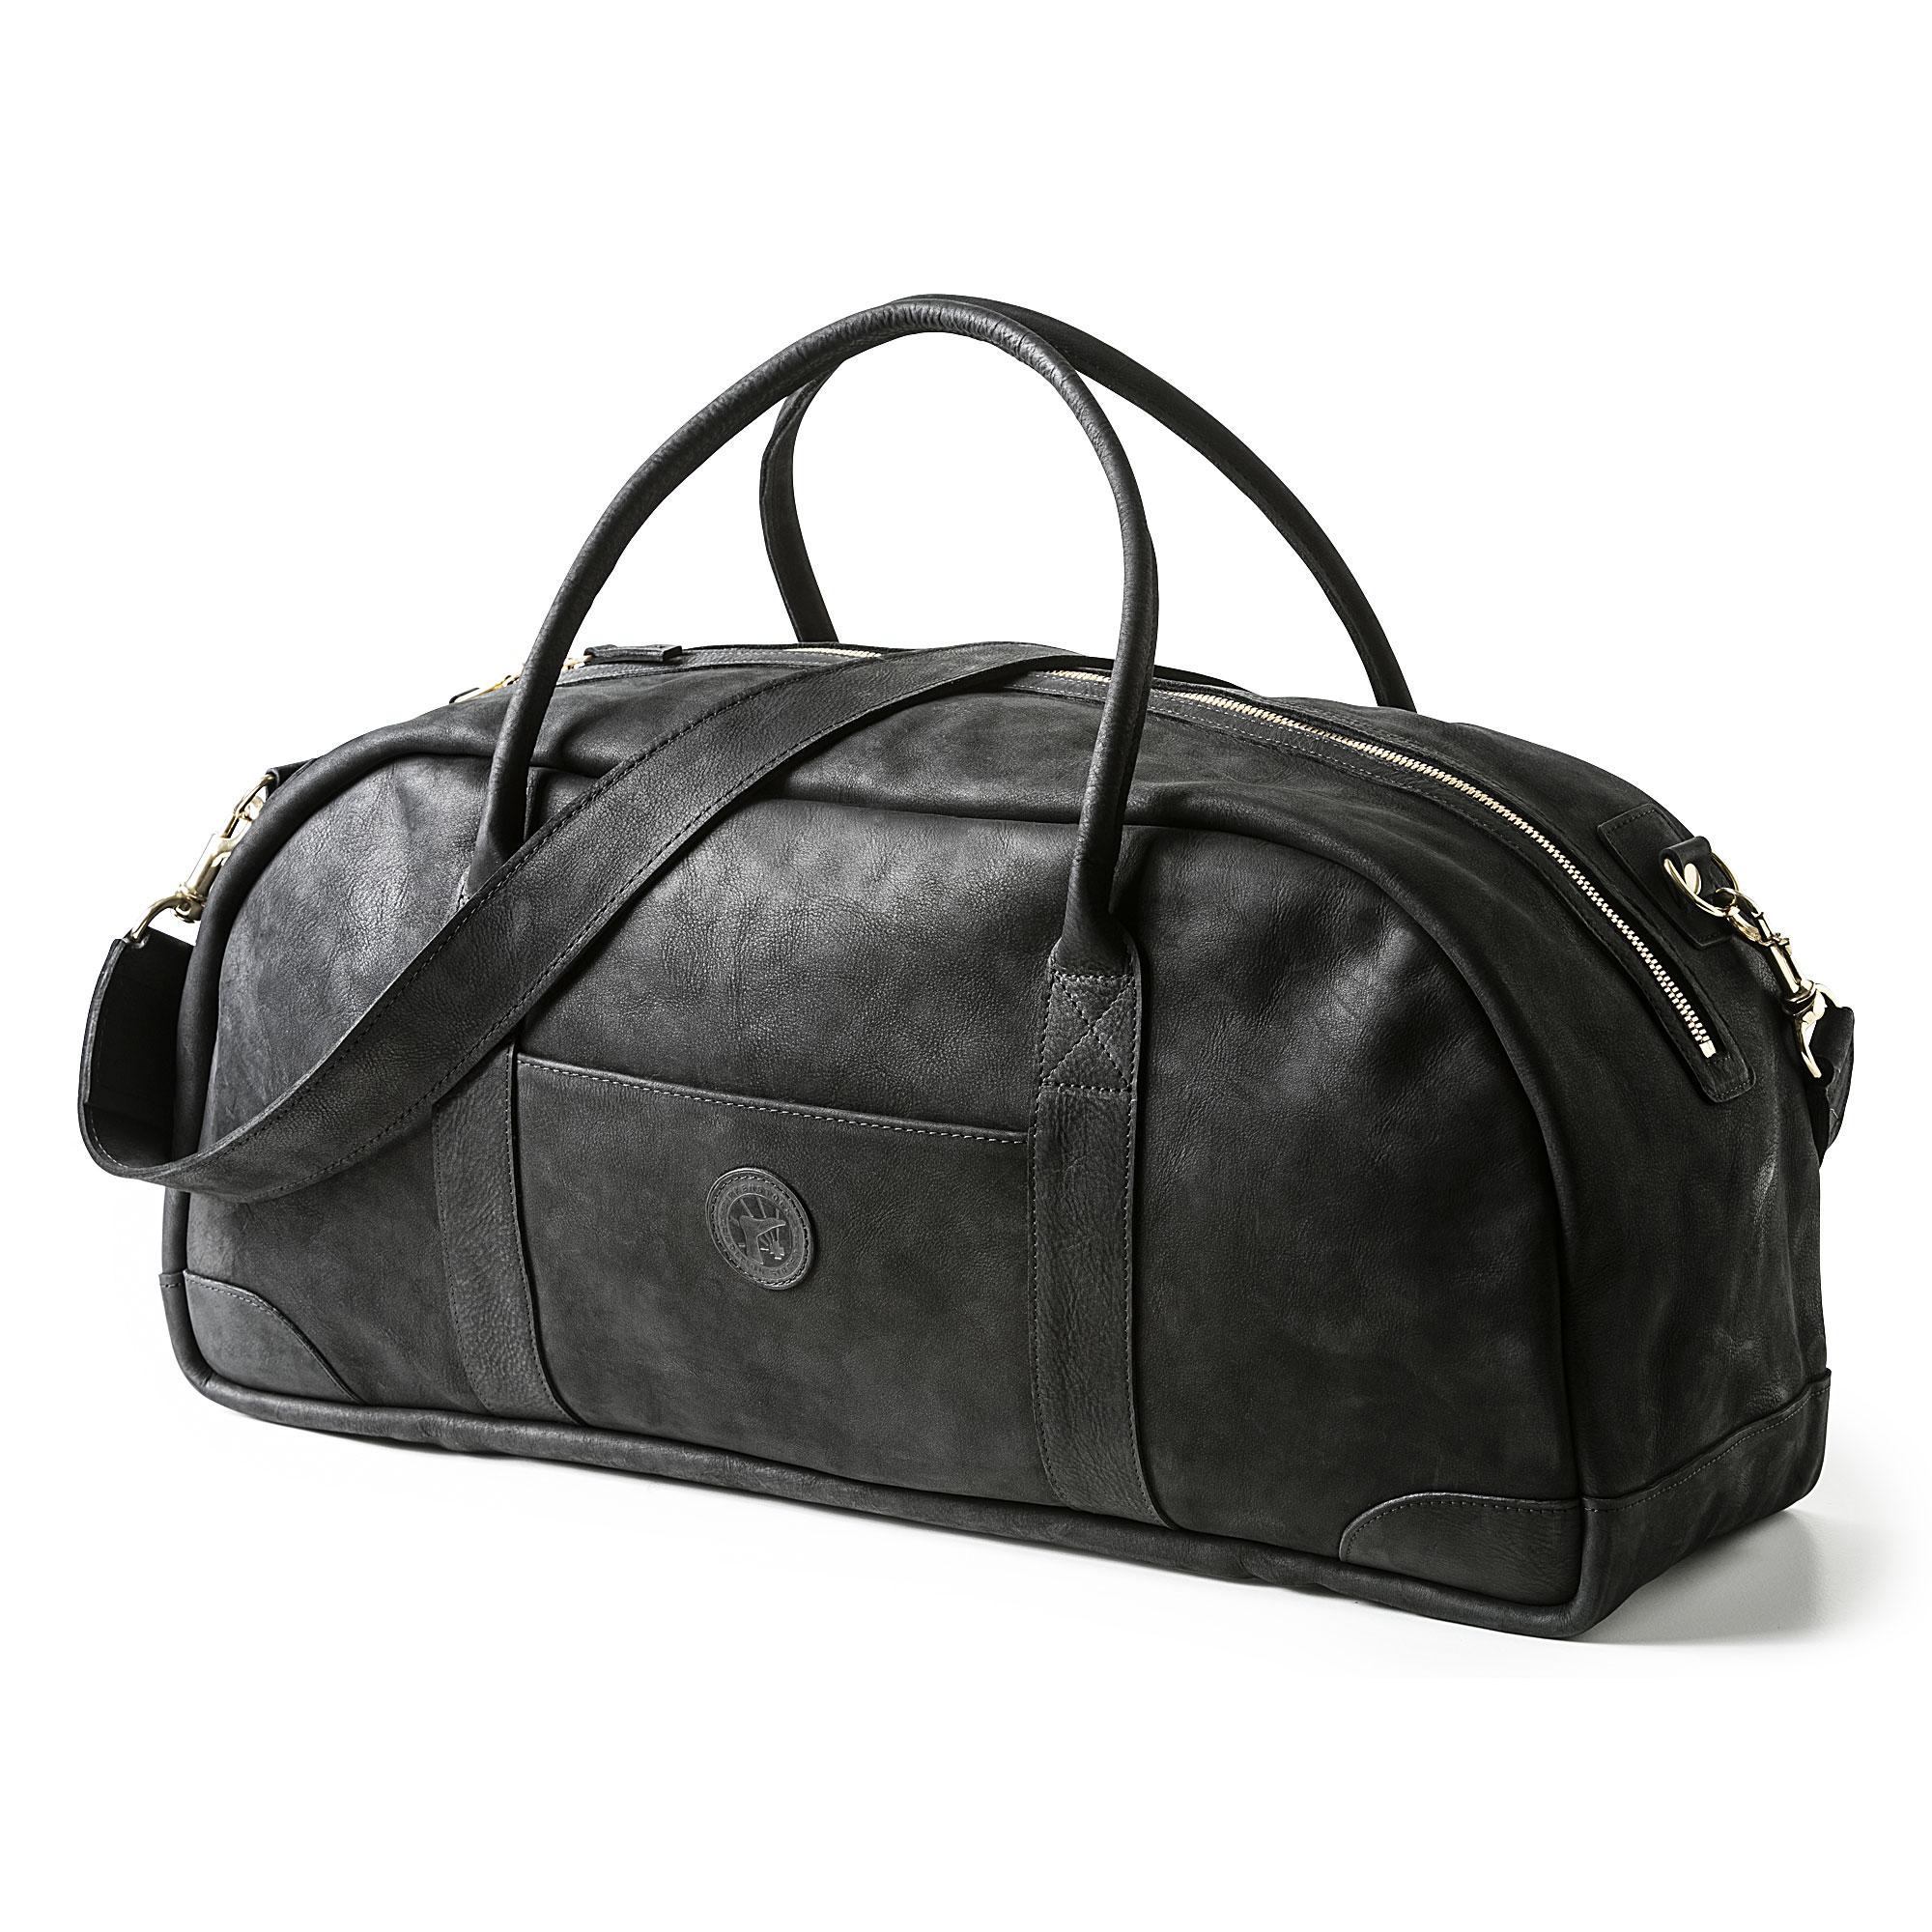 1ddb341acd Bag Hanover Black